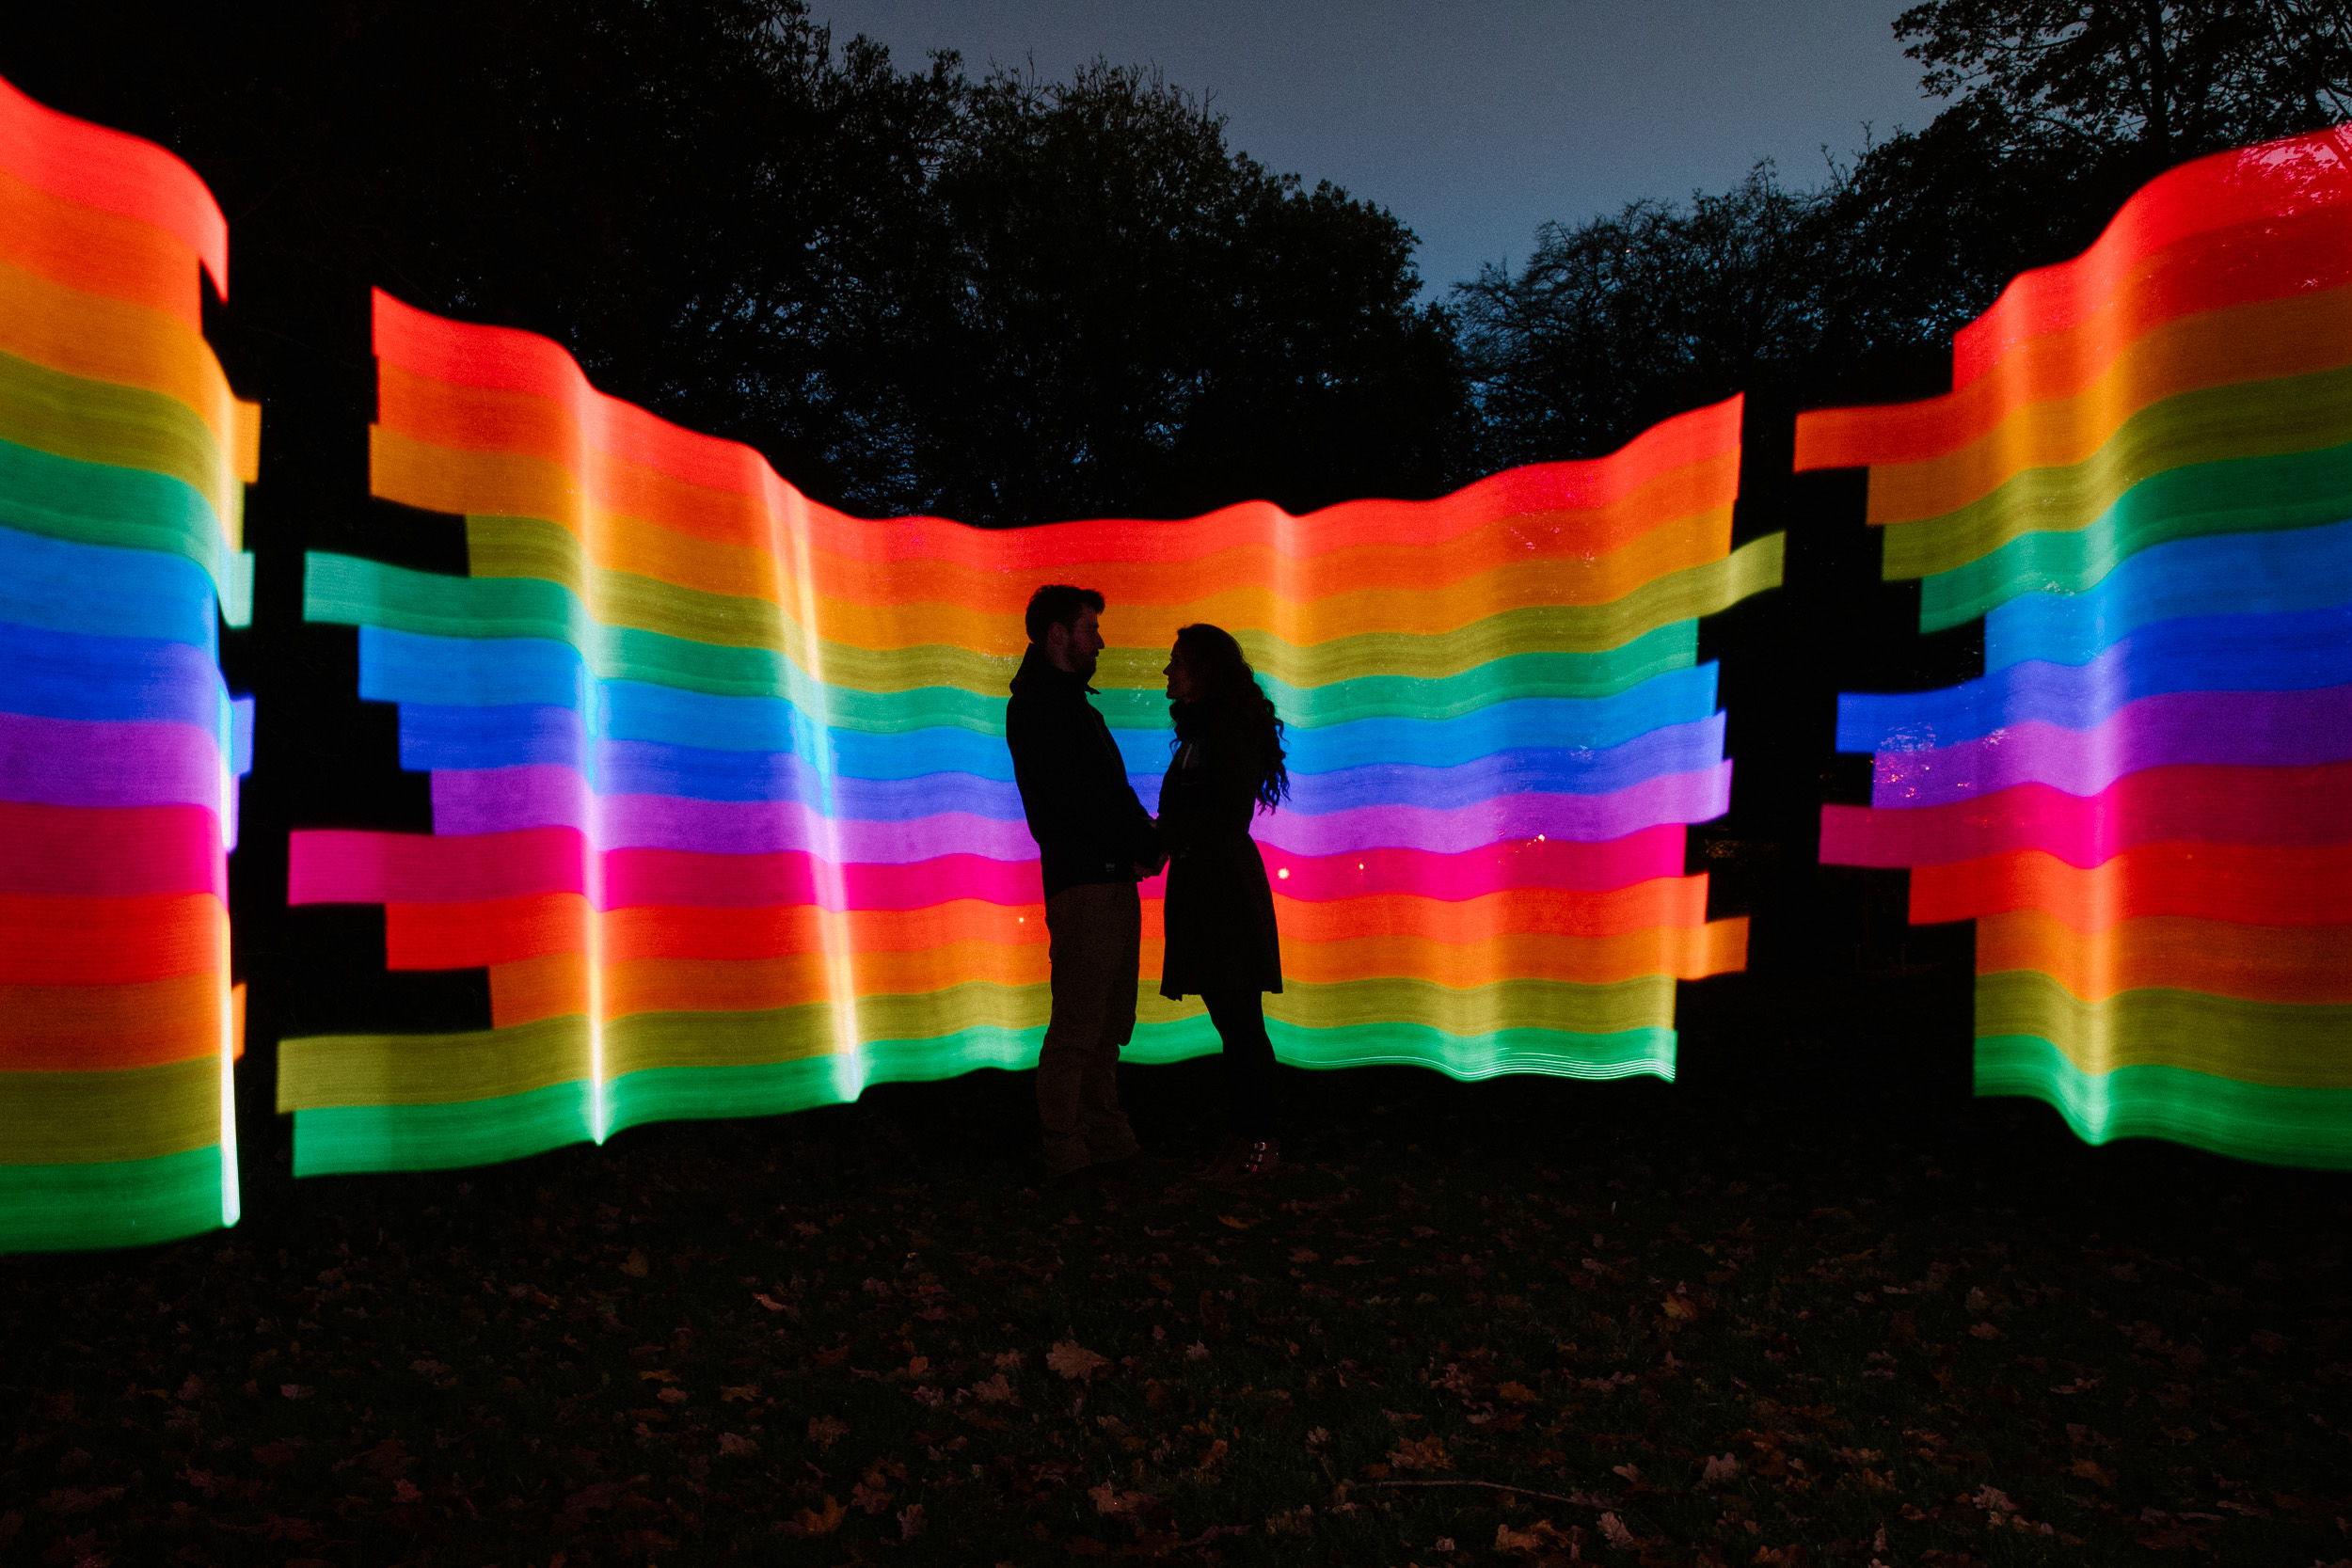 clairebyrnephotography-fun-wedding-photographer-ireland-creative-engagment-park-52.jpg